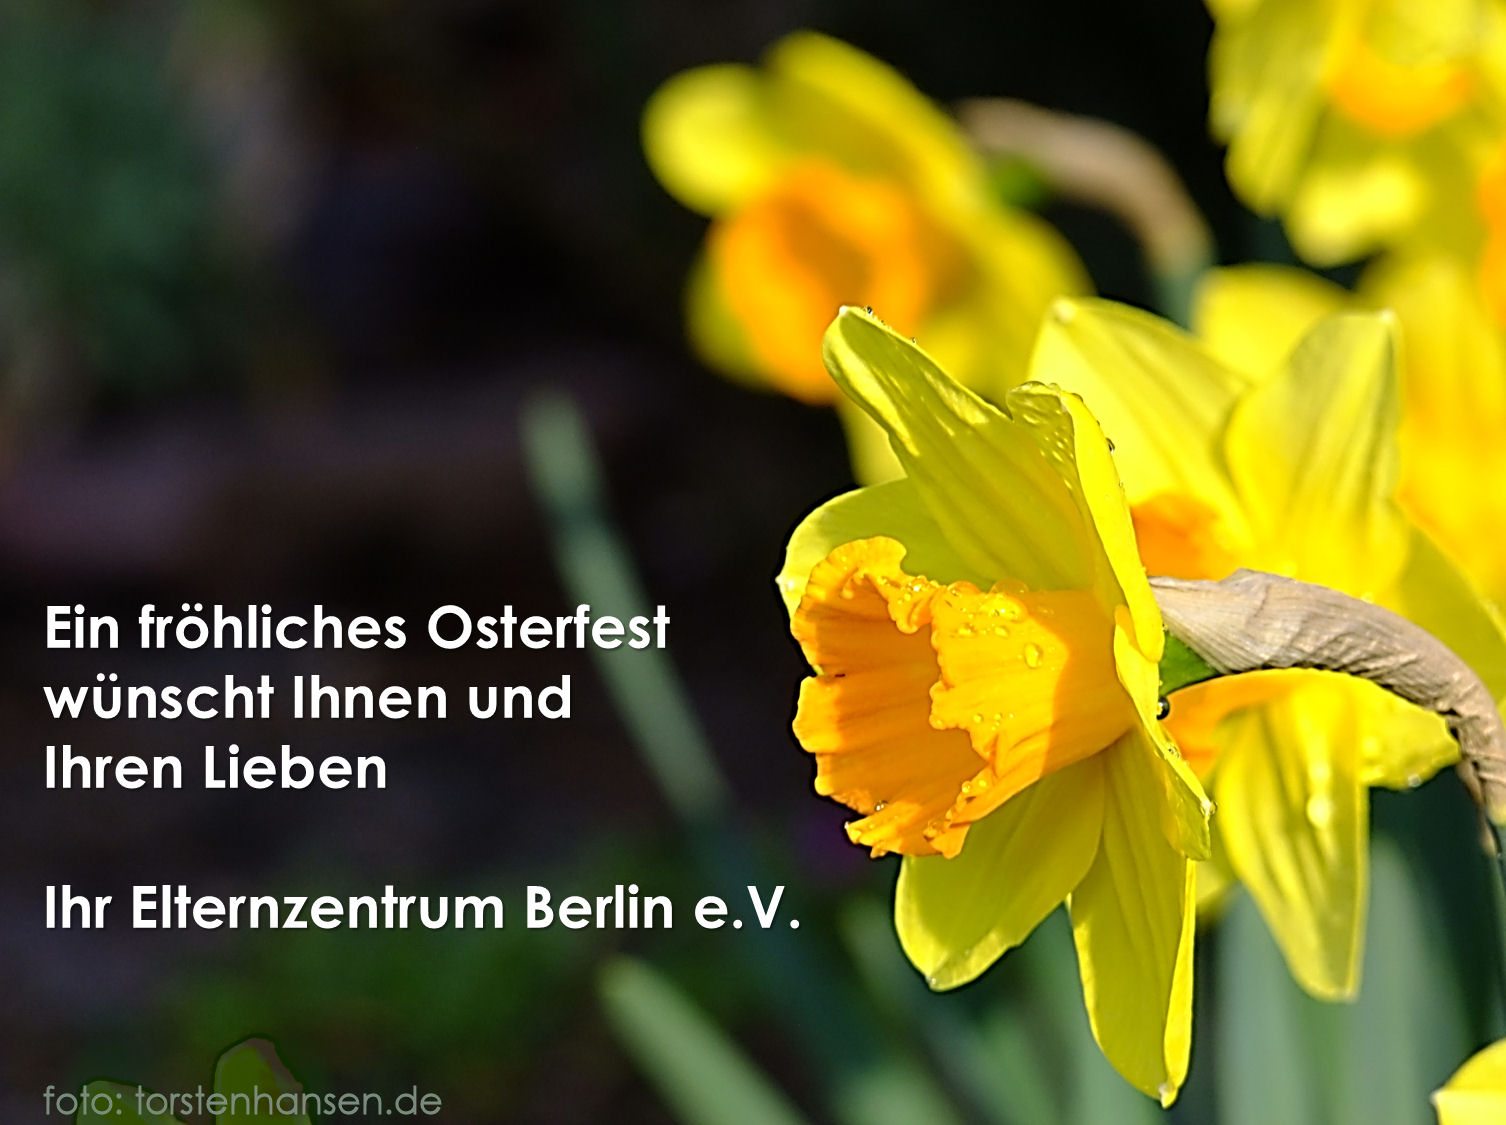 Fröhliche Ostern wünscht Ihr Elternzentrum Berlin e.V.